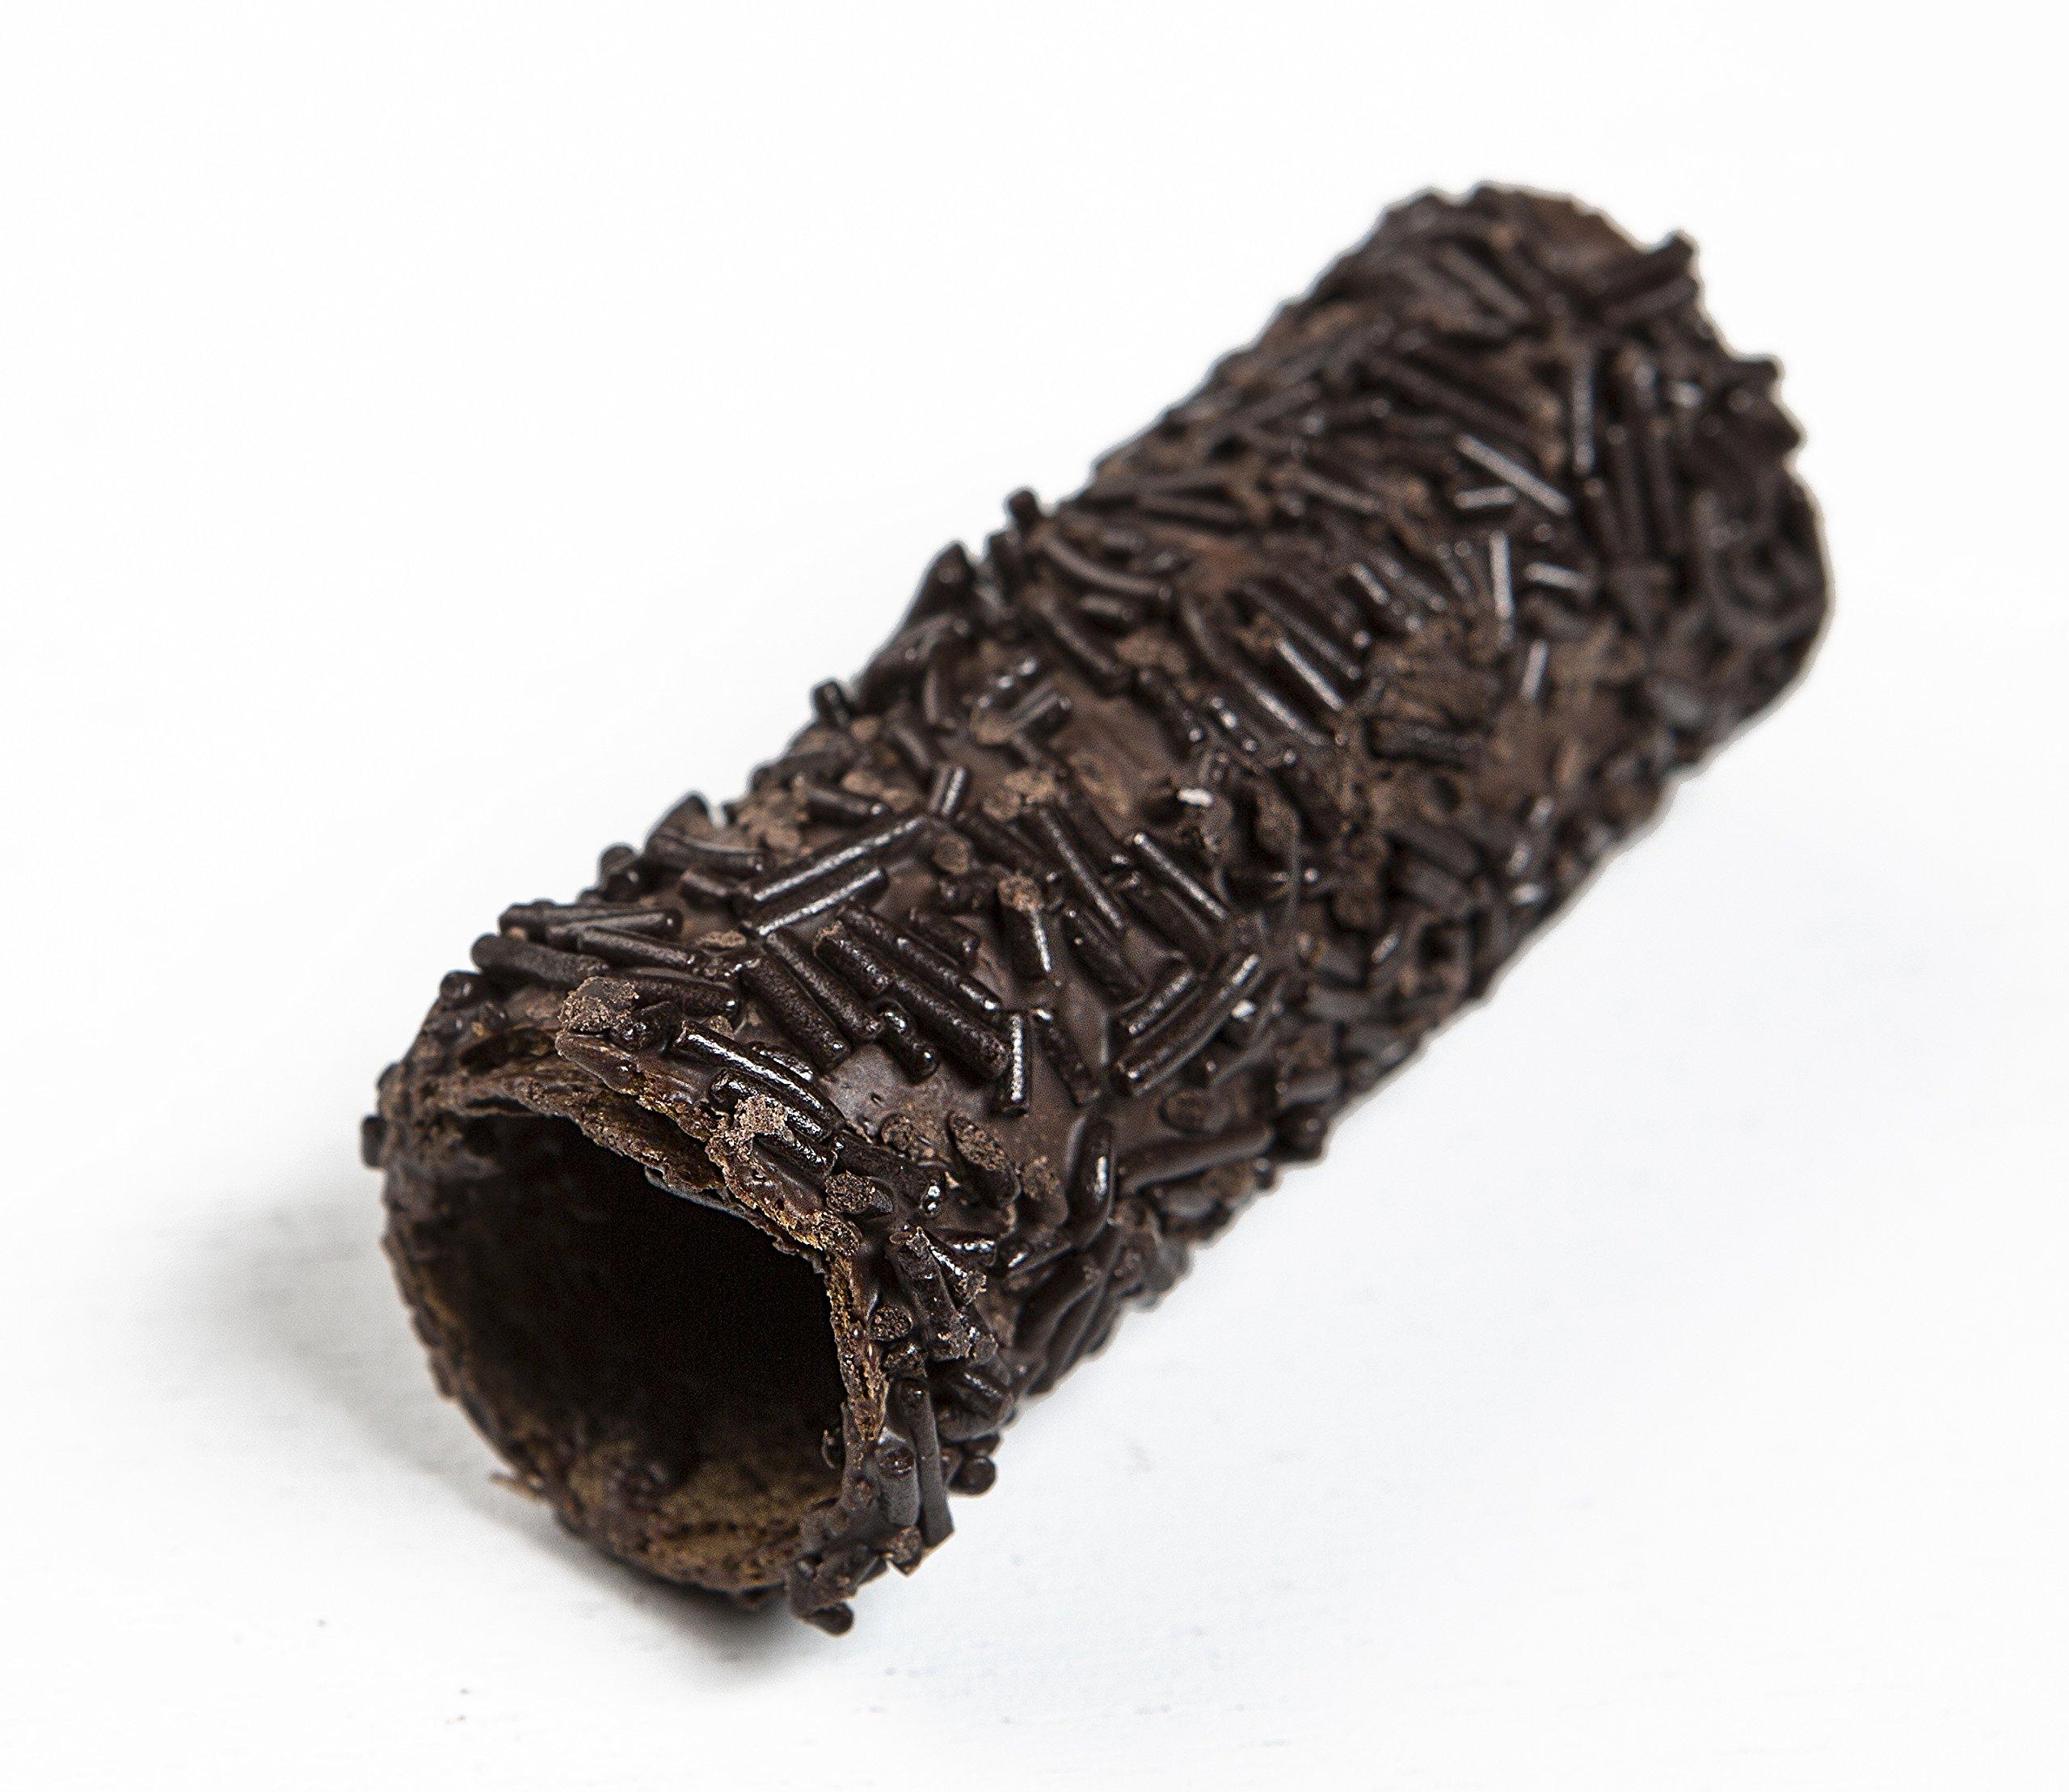 Bakersland Wafer Roll 2.5''x1'' Dark Choco, Choco Sprinkles, 60 Pcs. by Bakersland (Image #1)